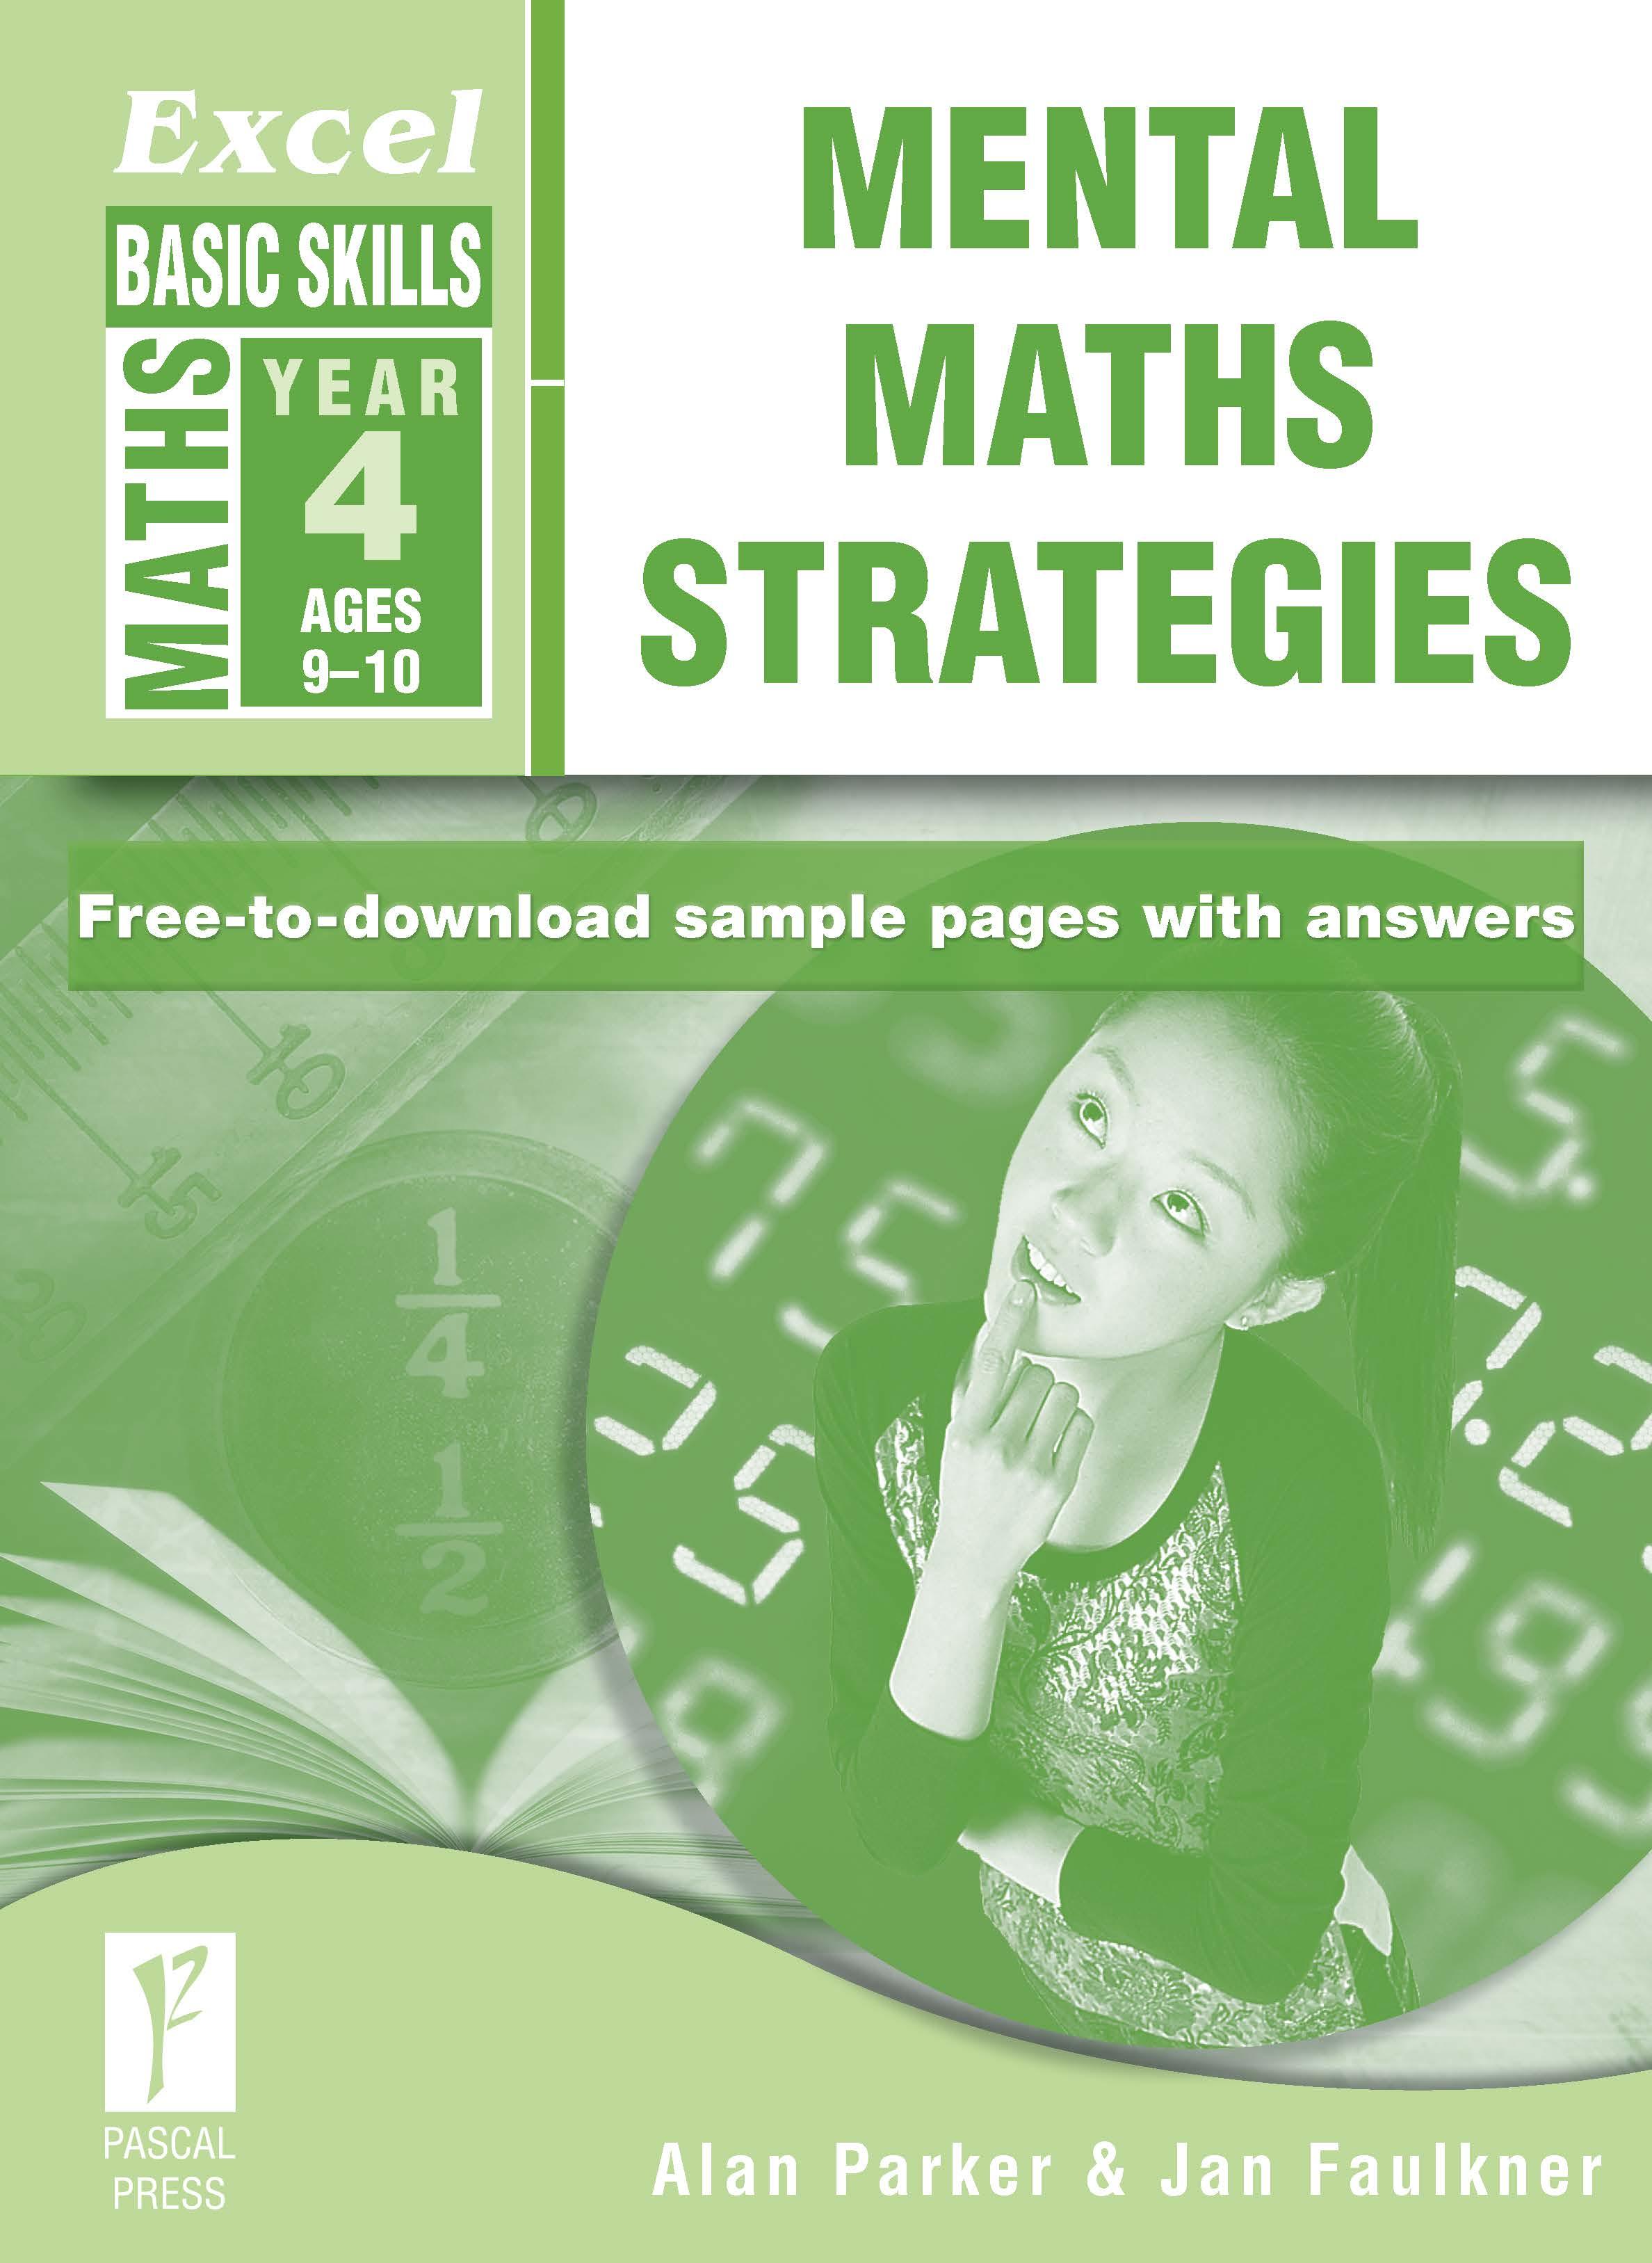 Excel Basic Skills Mental Maths Strategies Year 4